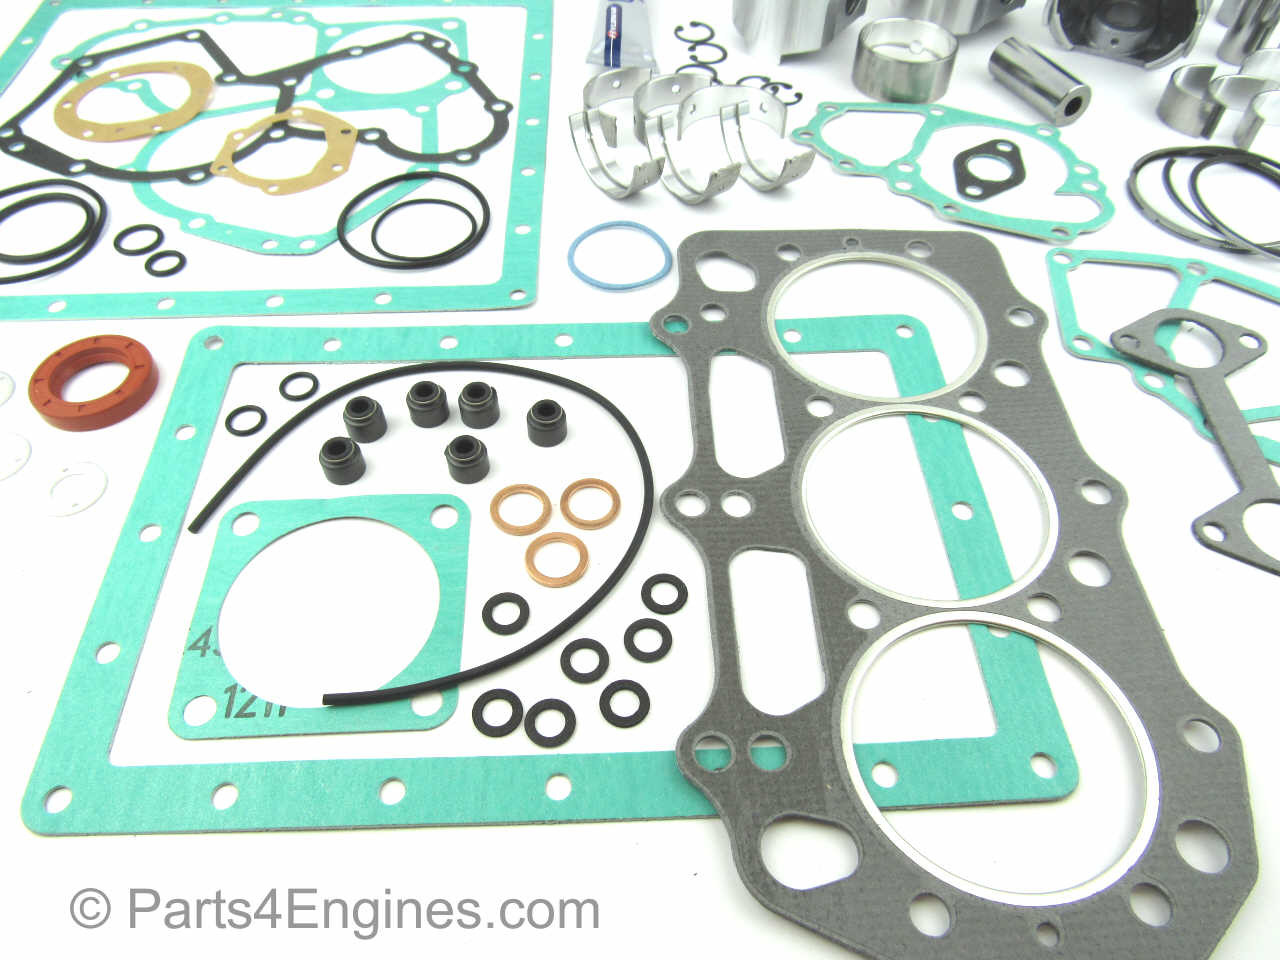 Perkins 100 Series 103.09 Engine Overhaul kit - parts4engines.com